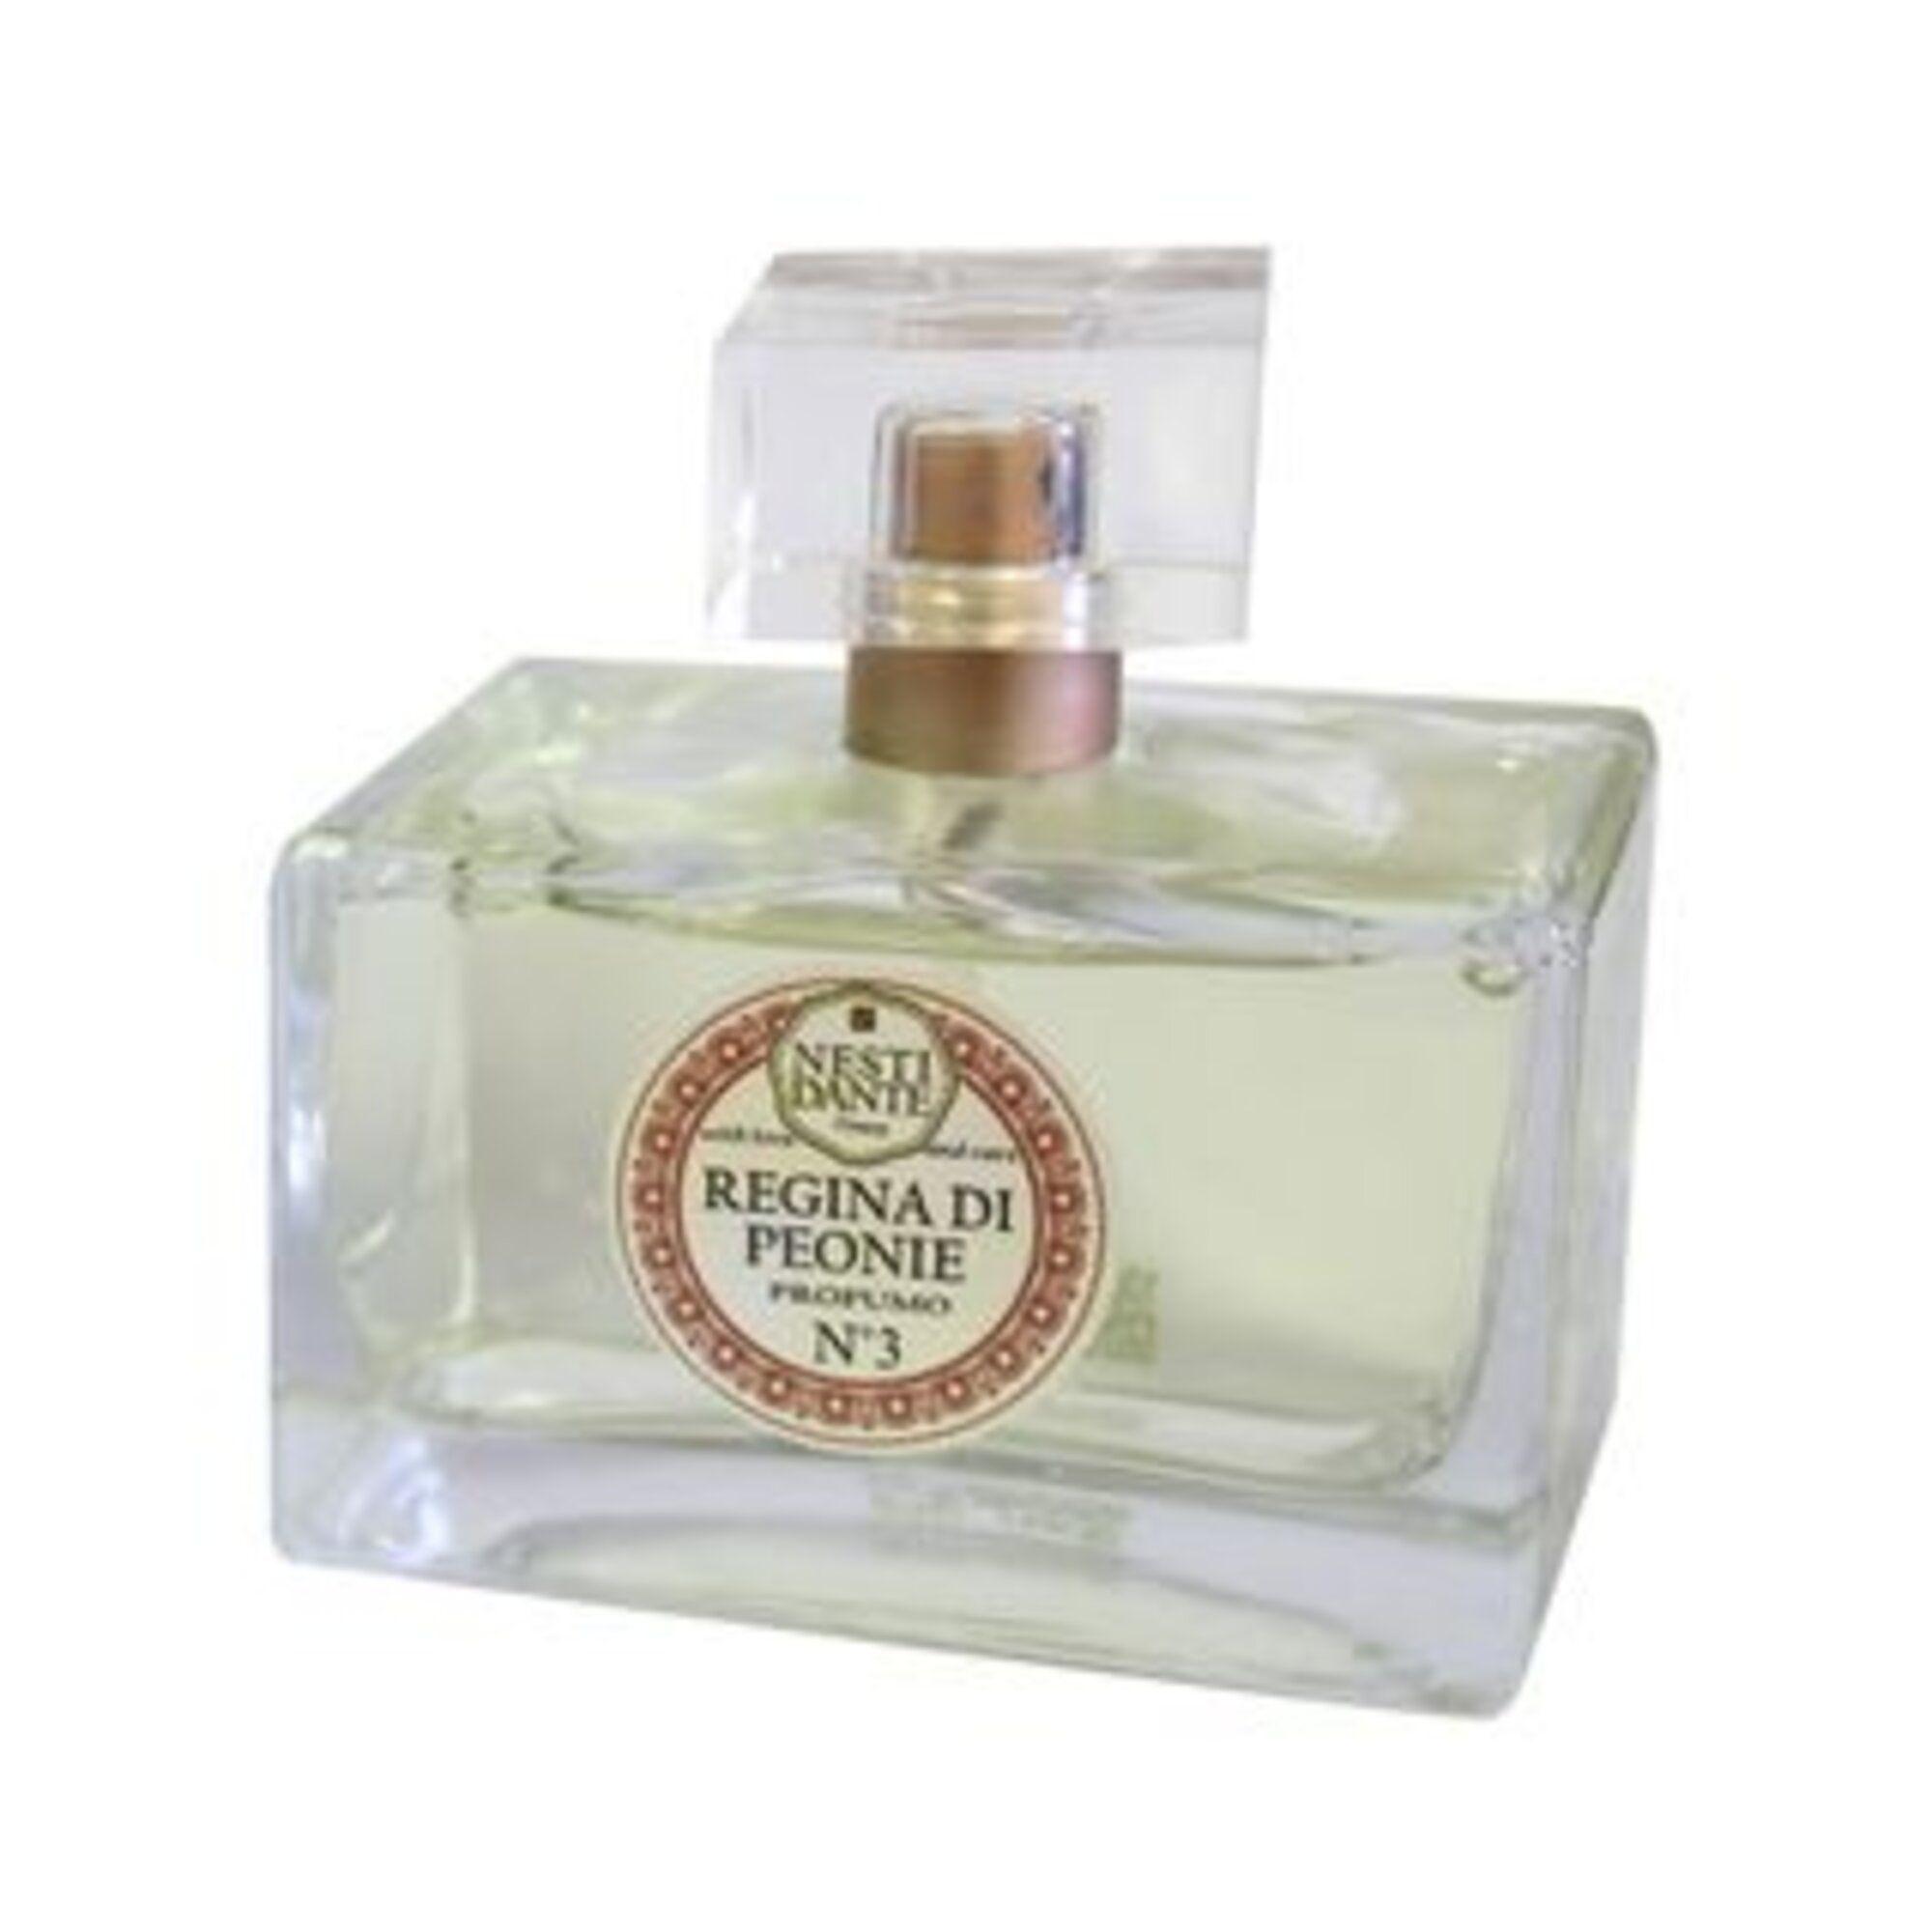 Perfume Regina Di Peonie 100mL Nesti Dante